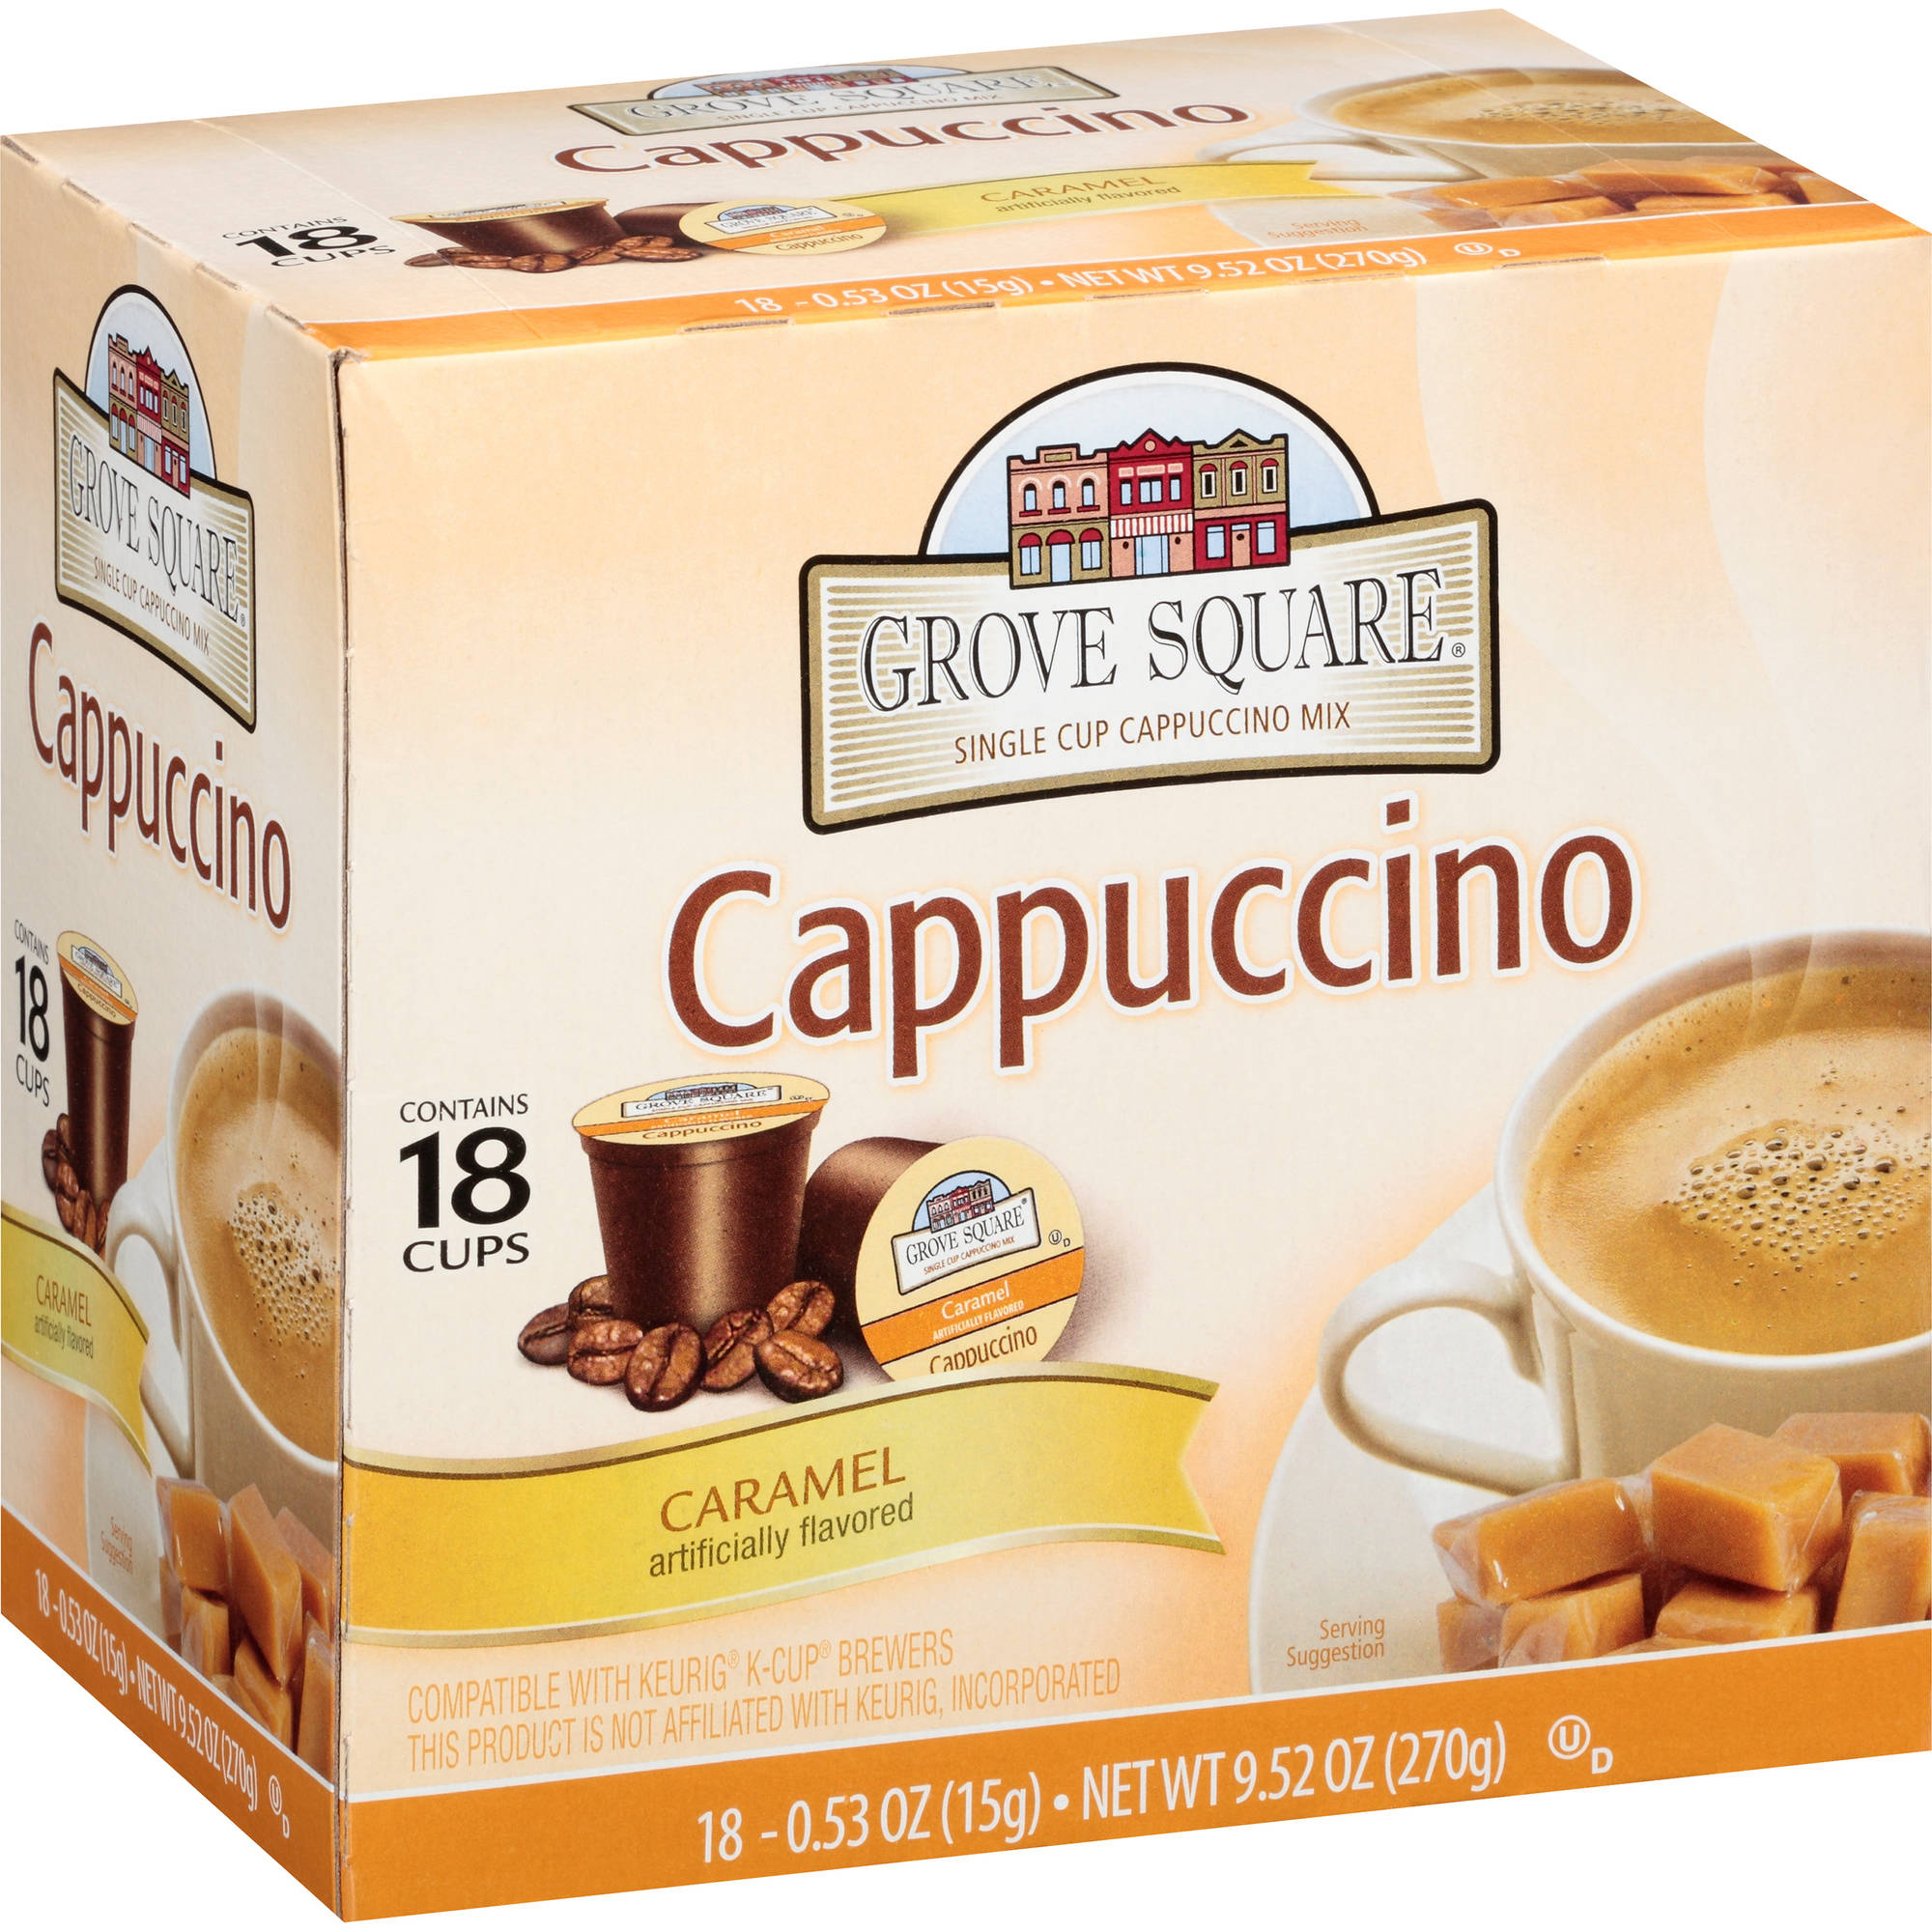 Grove Square Caramel Single Cup Cappuccino Mix, 18 count, 9.52 oz